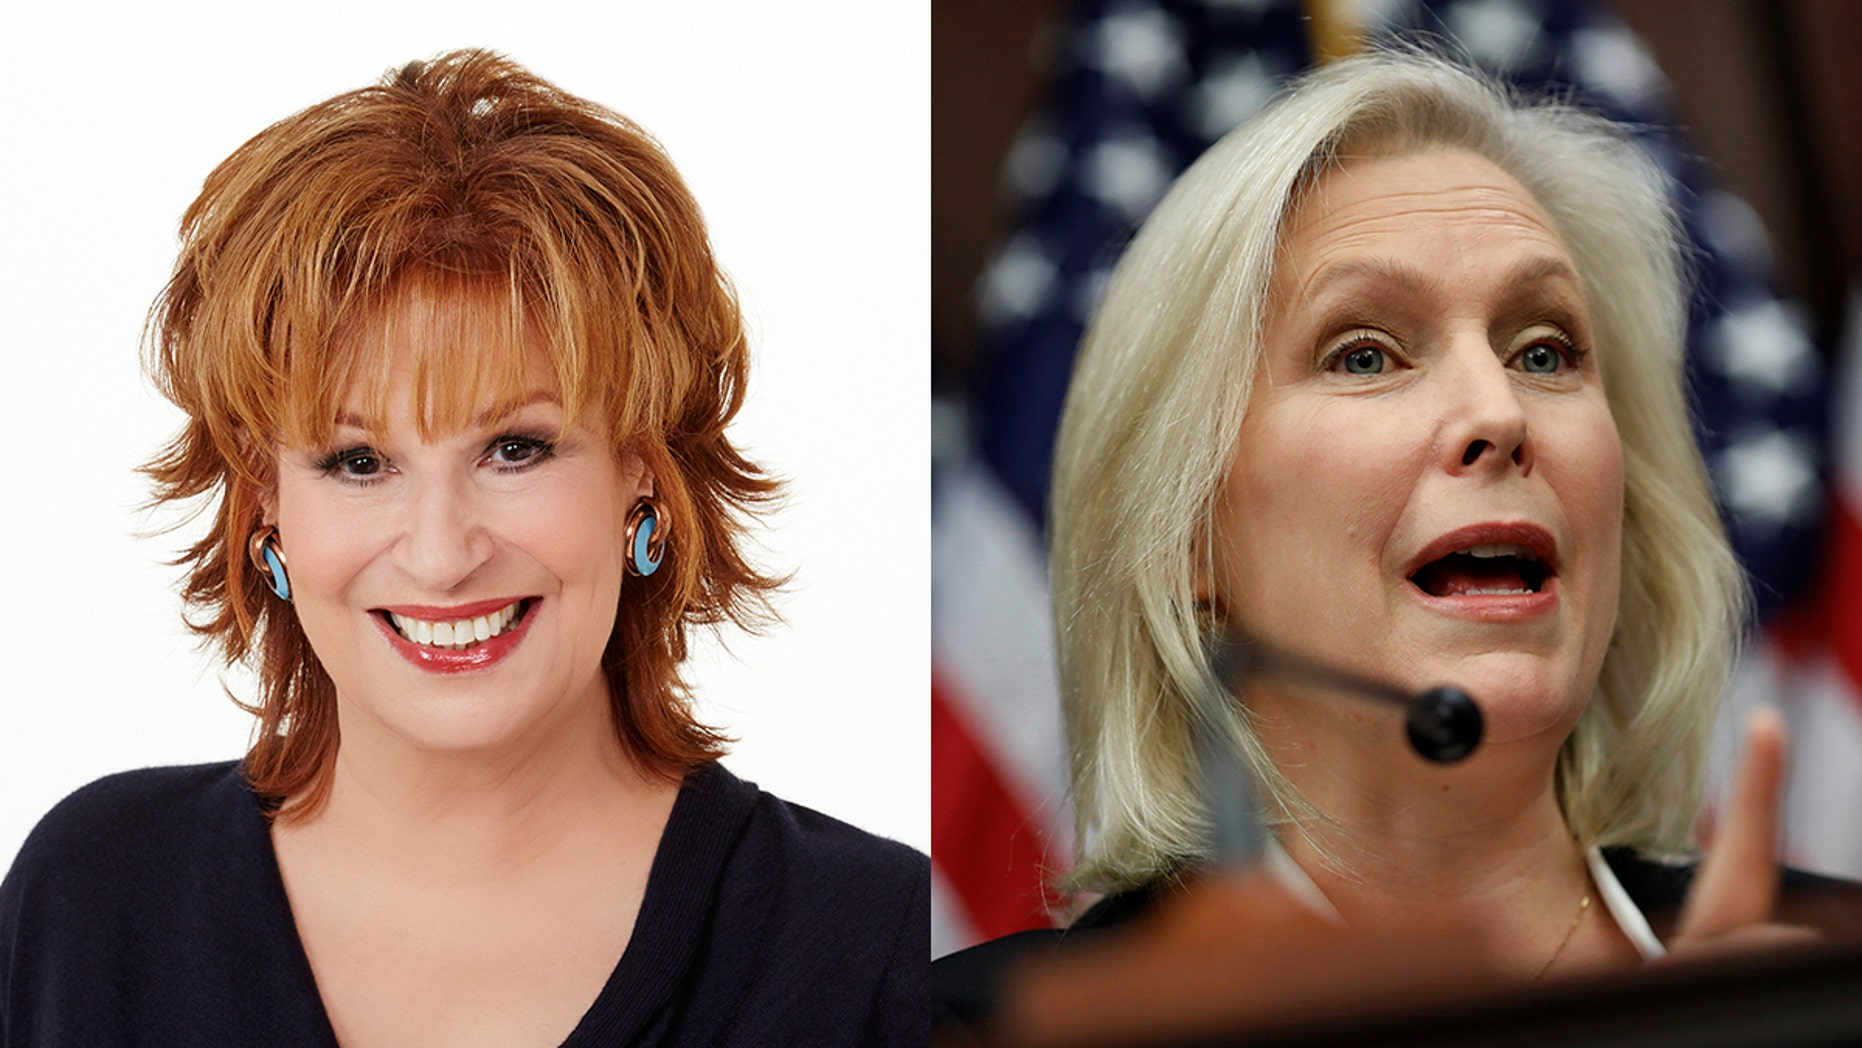 Joy Behar and Democratic Senator Kirsten Gillibrand got heated over the resignation of Al Franken on a recent episode of 'The View.'